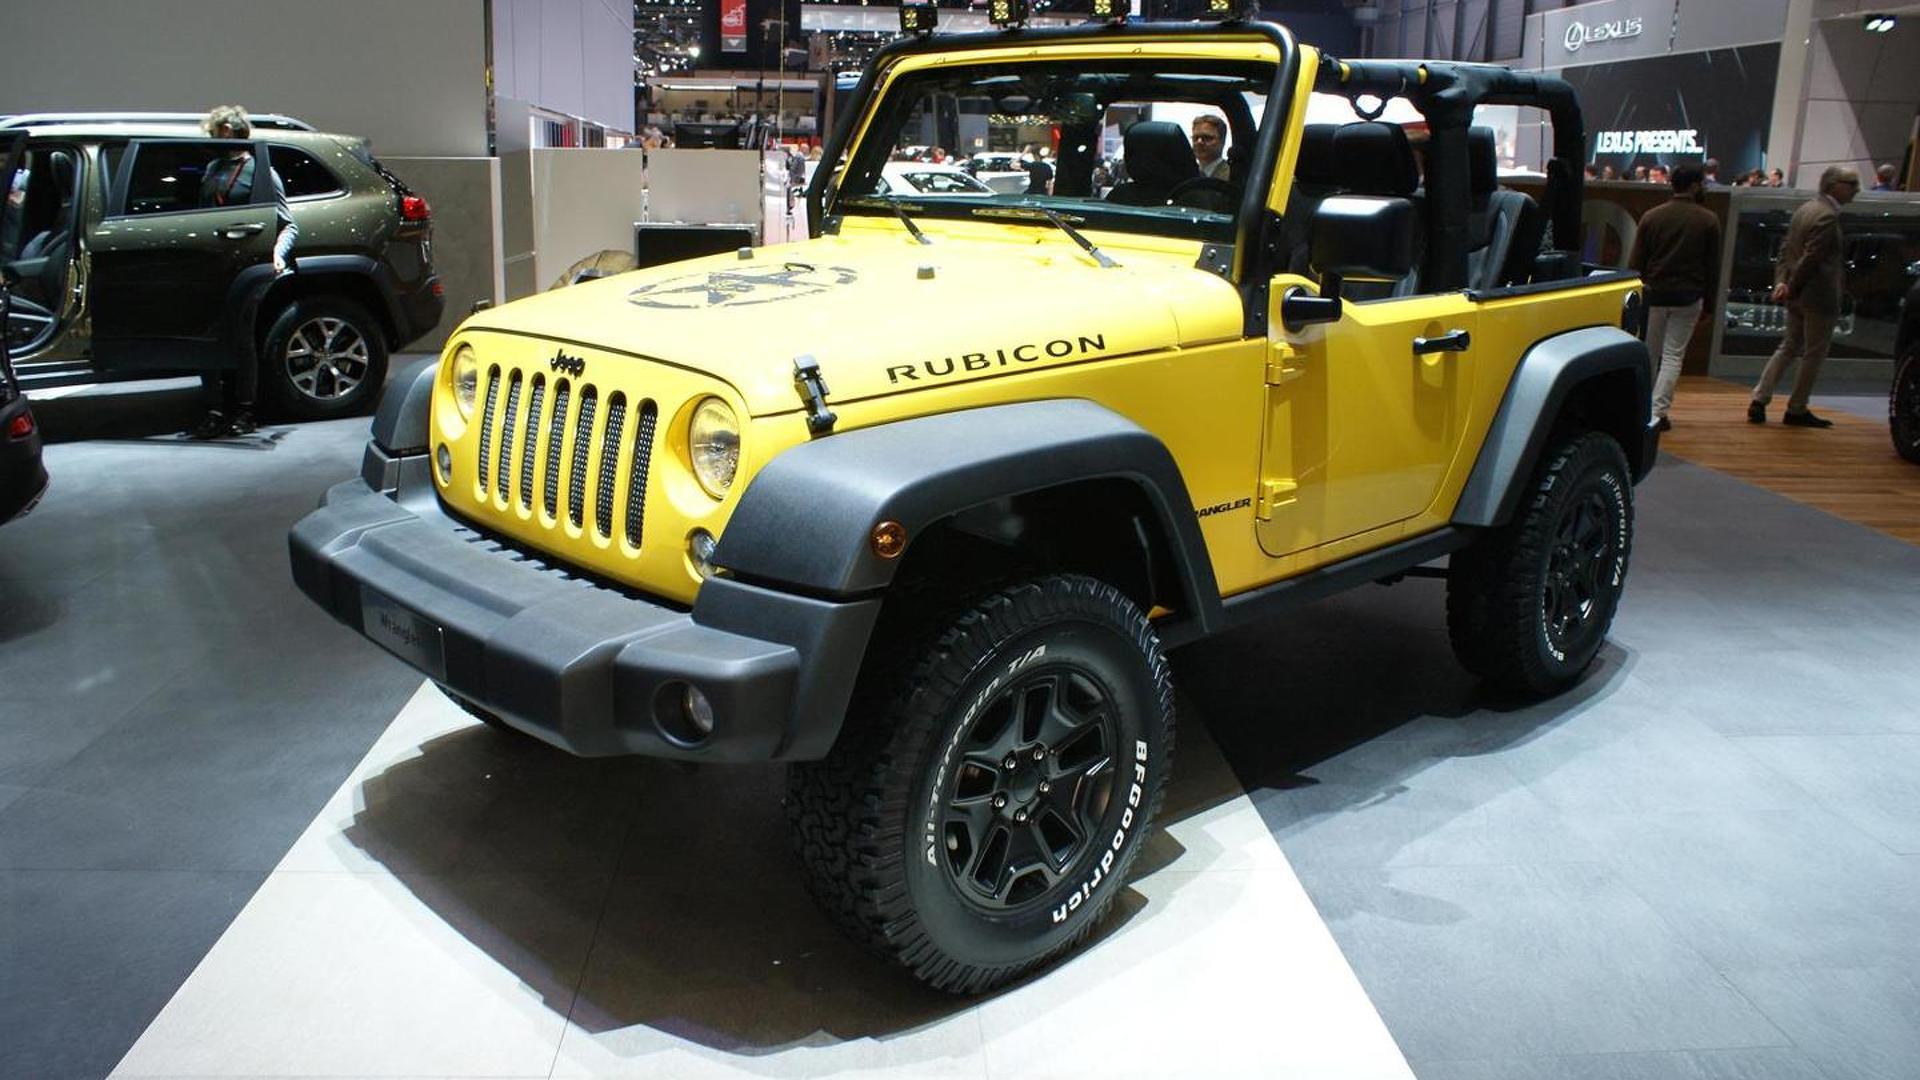 2015 jeep wrangler rubicon rocks star unveiled ahead of geneva debut. Black Bedroom Furniture Sets. Home Design Ideas